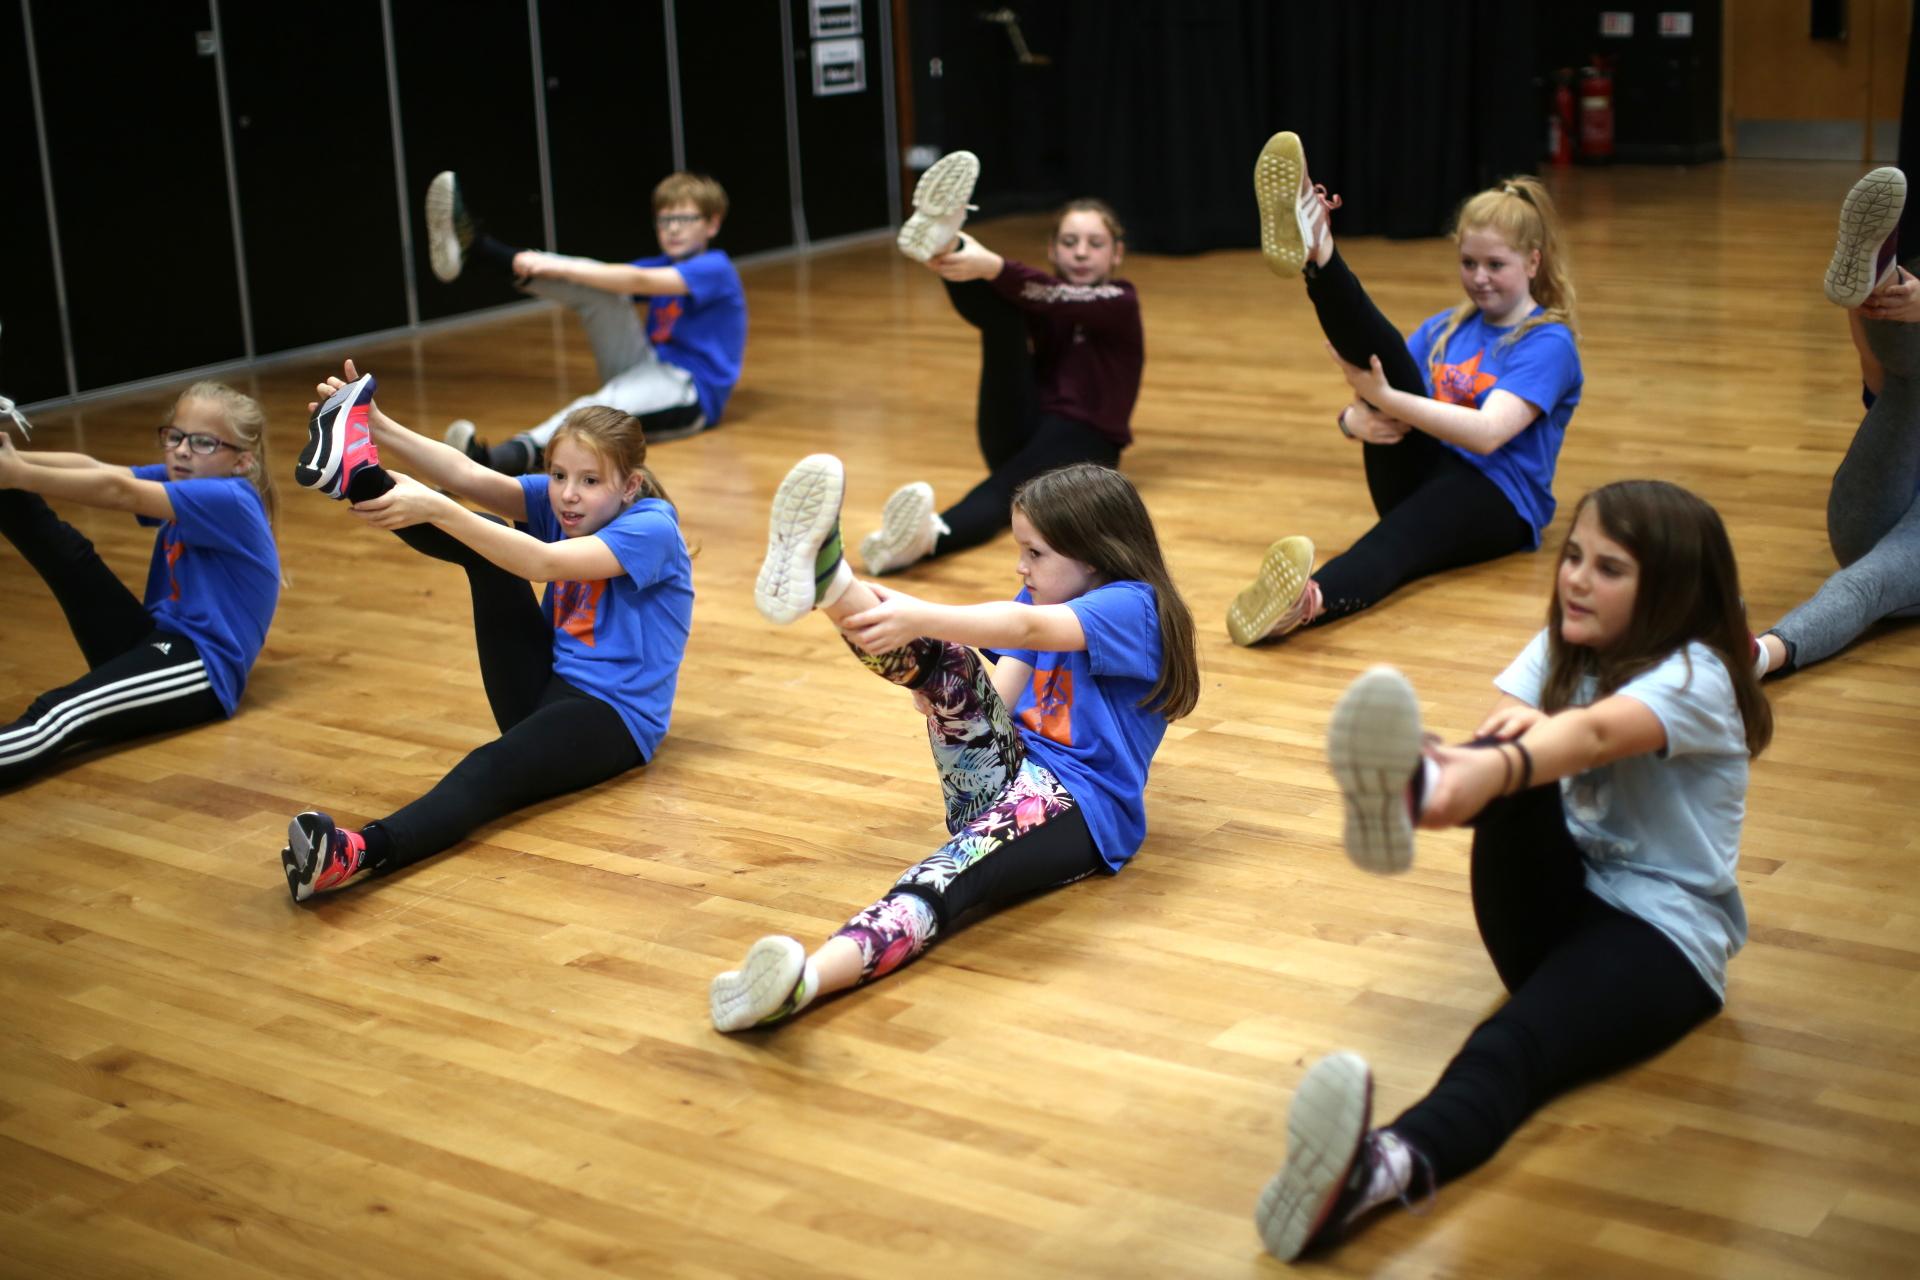 Youth Dance & Drama Aged 10+